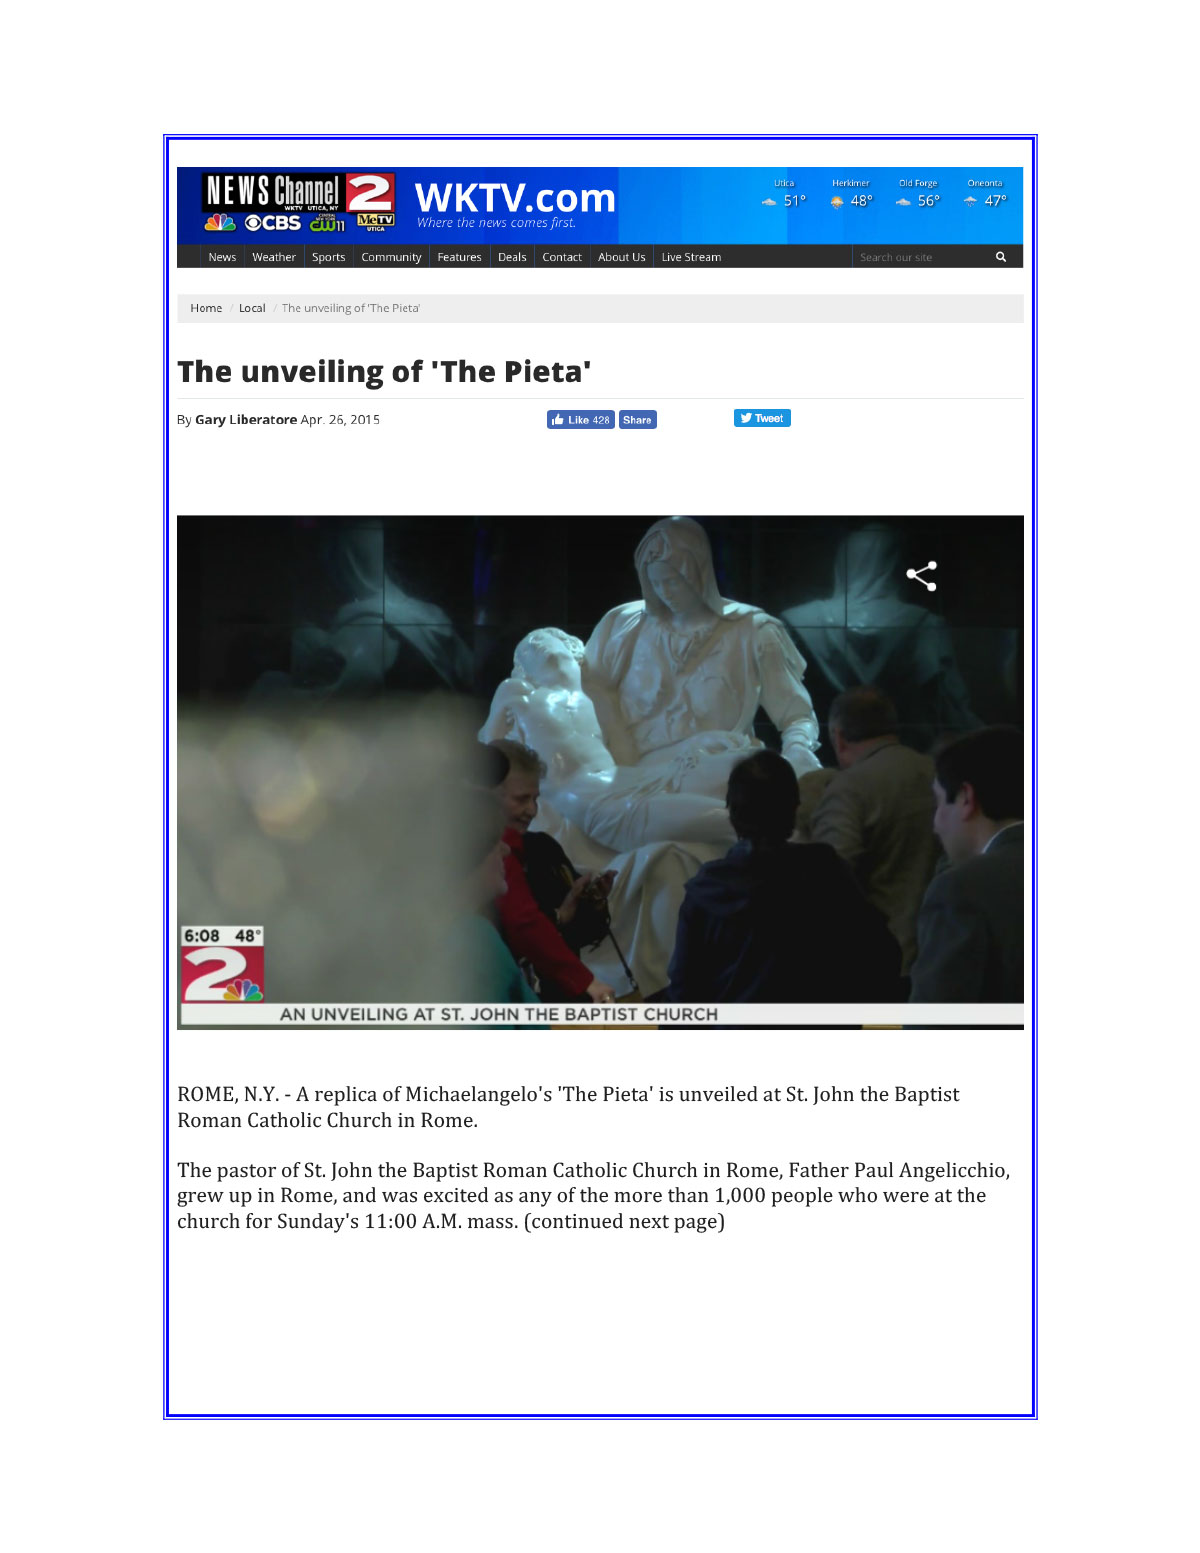 WKTV 2 News Rome, NY April 2015